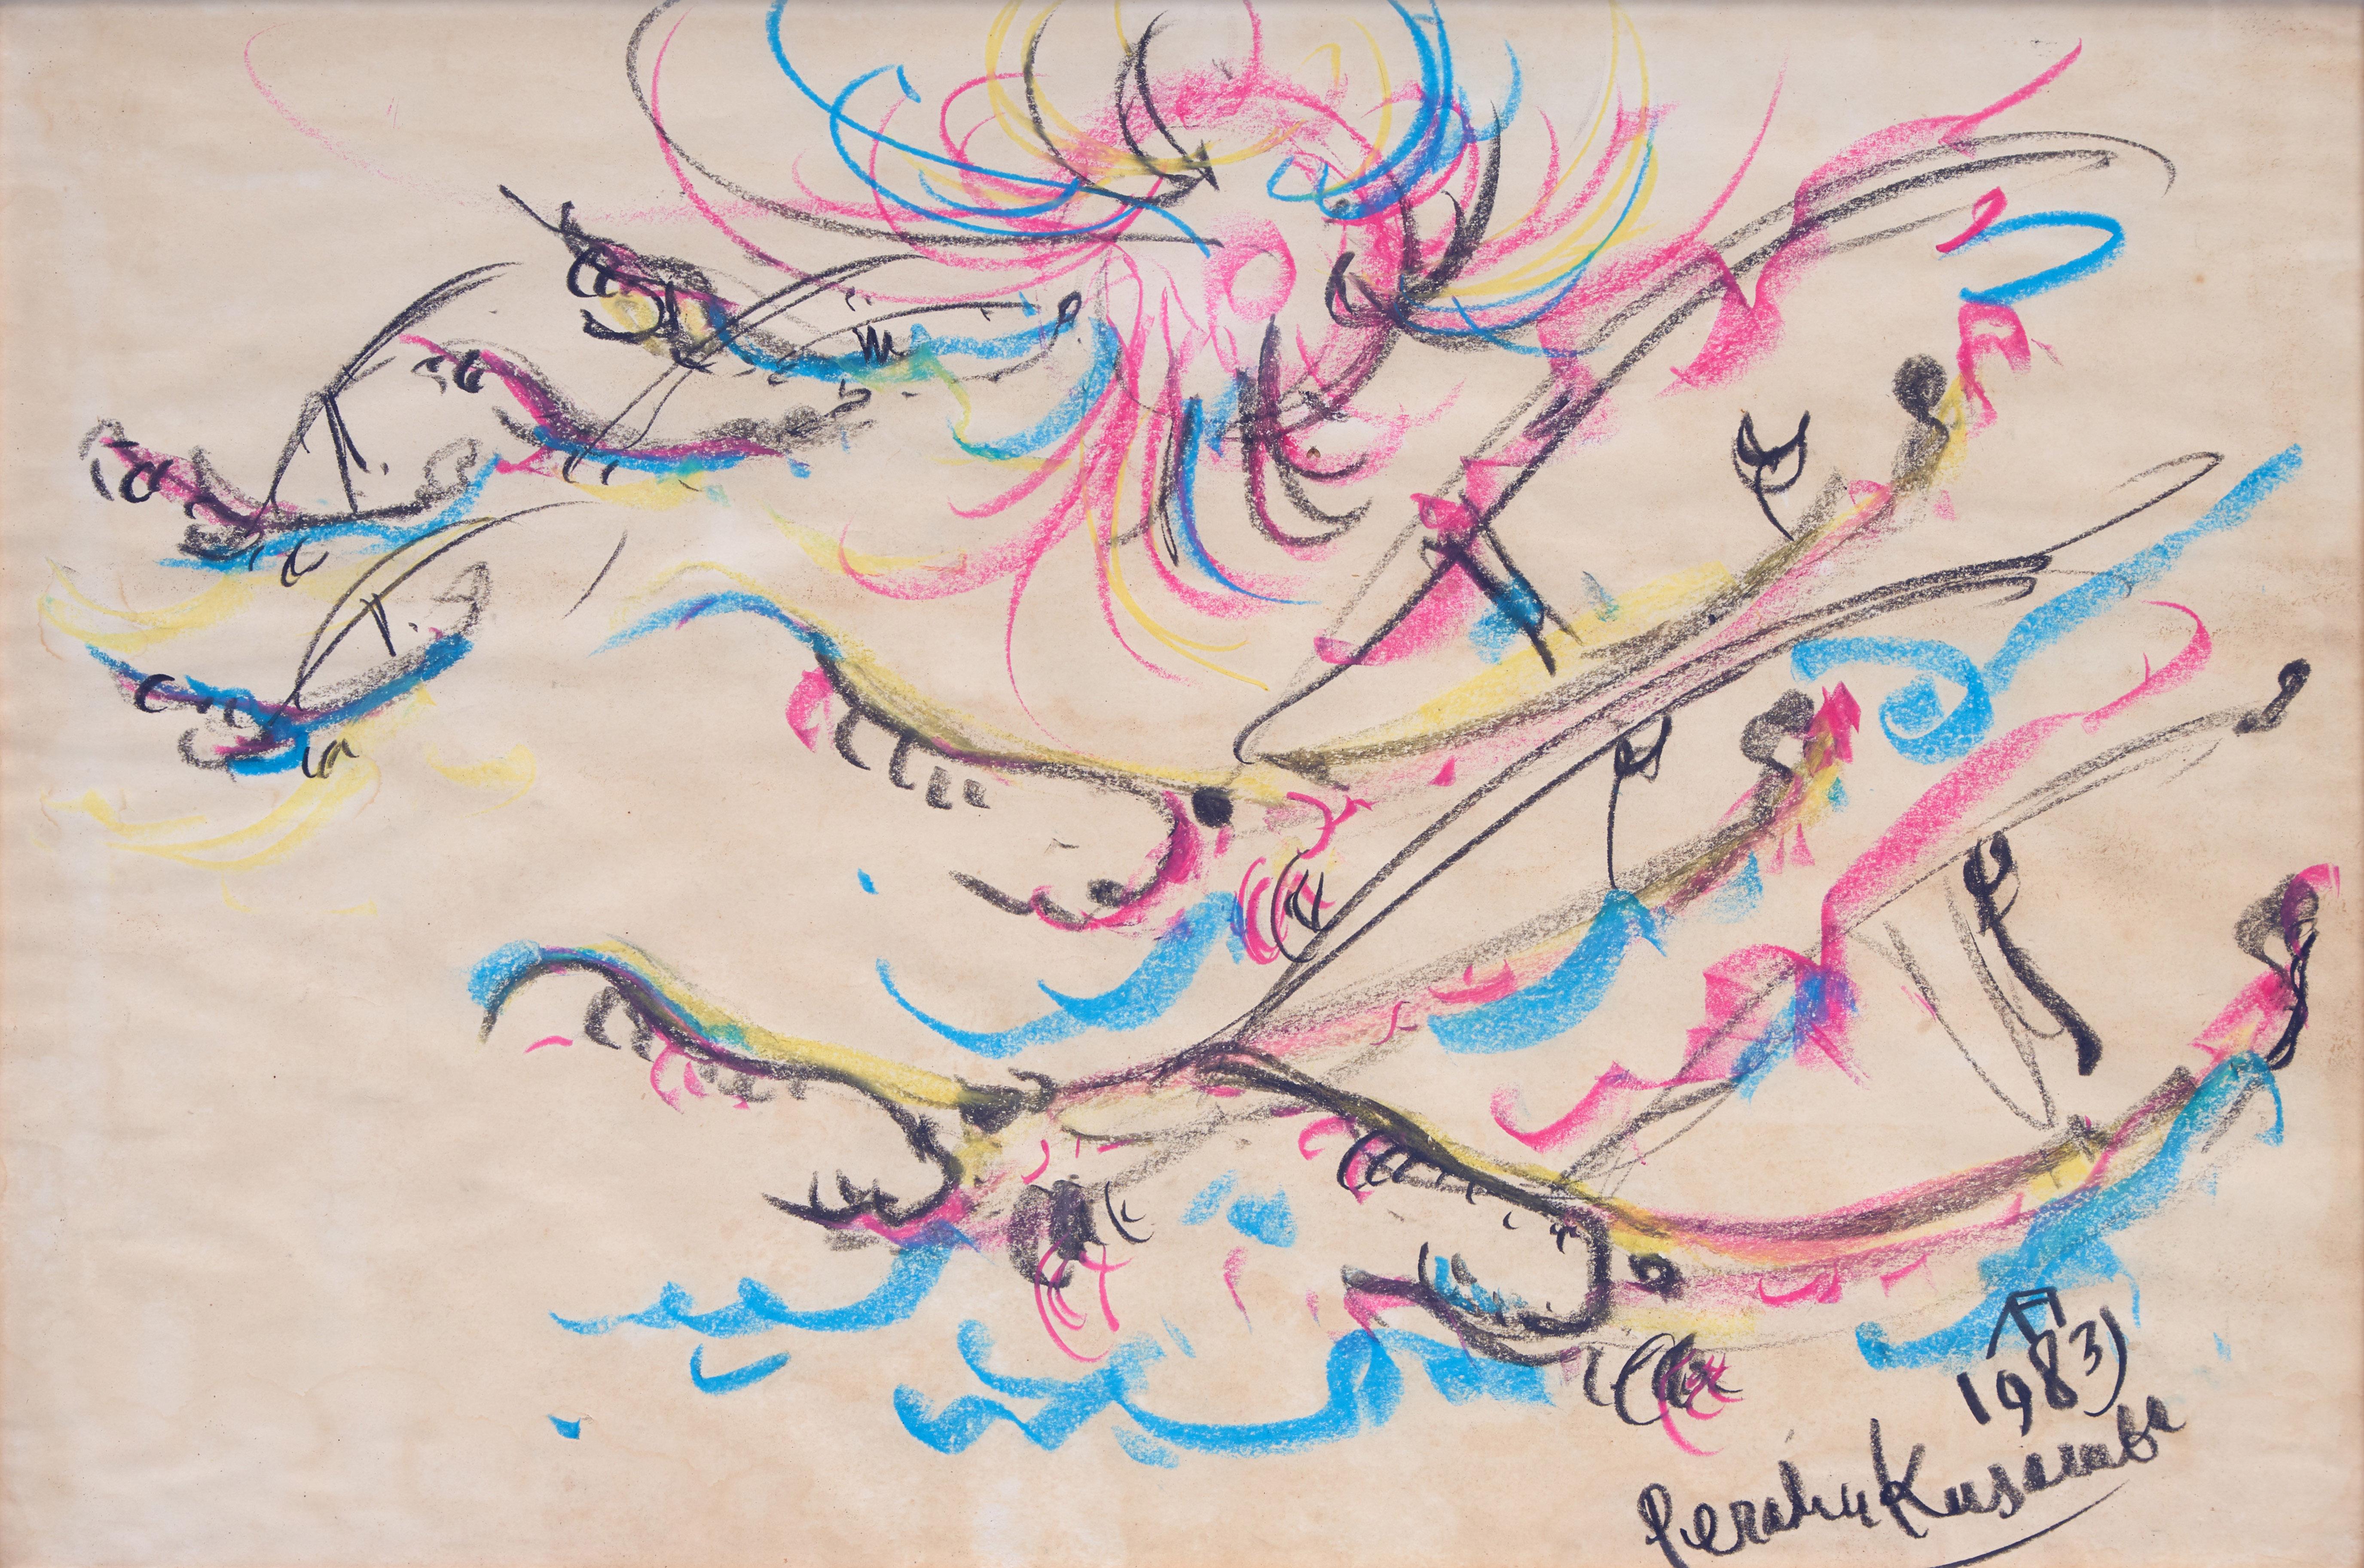 Affandi, Perahu Kusamba, 53.5 x 79.5 cm